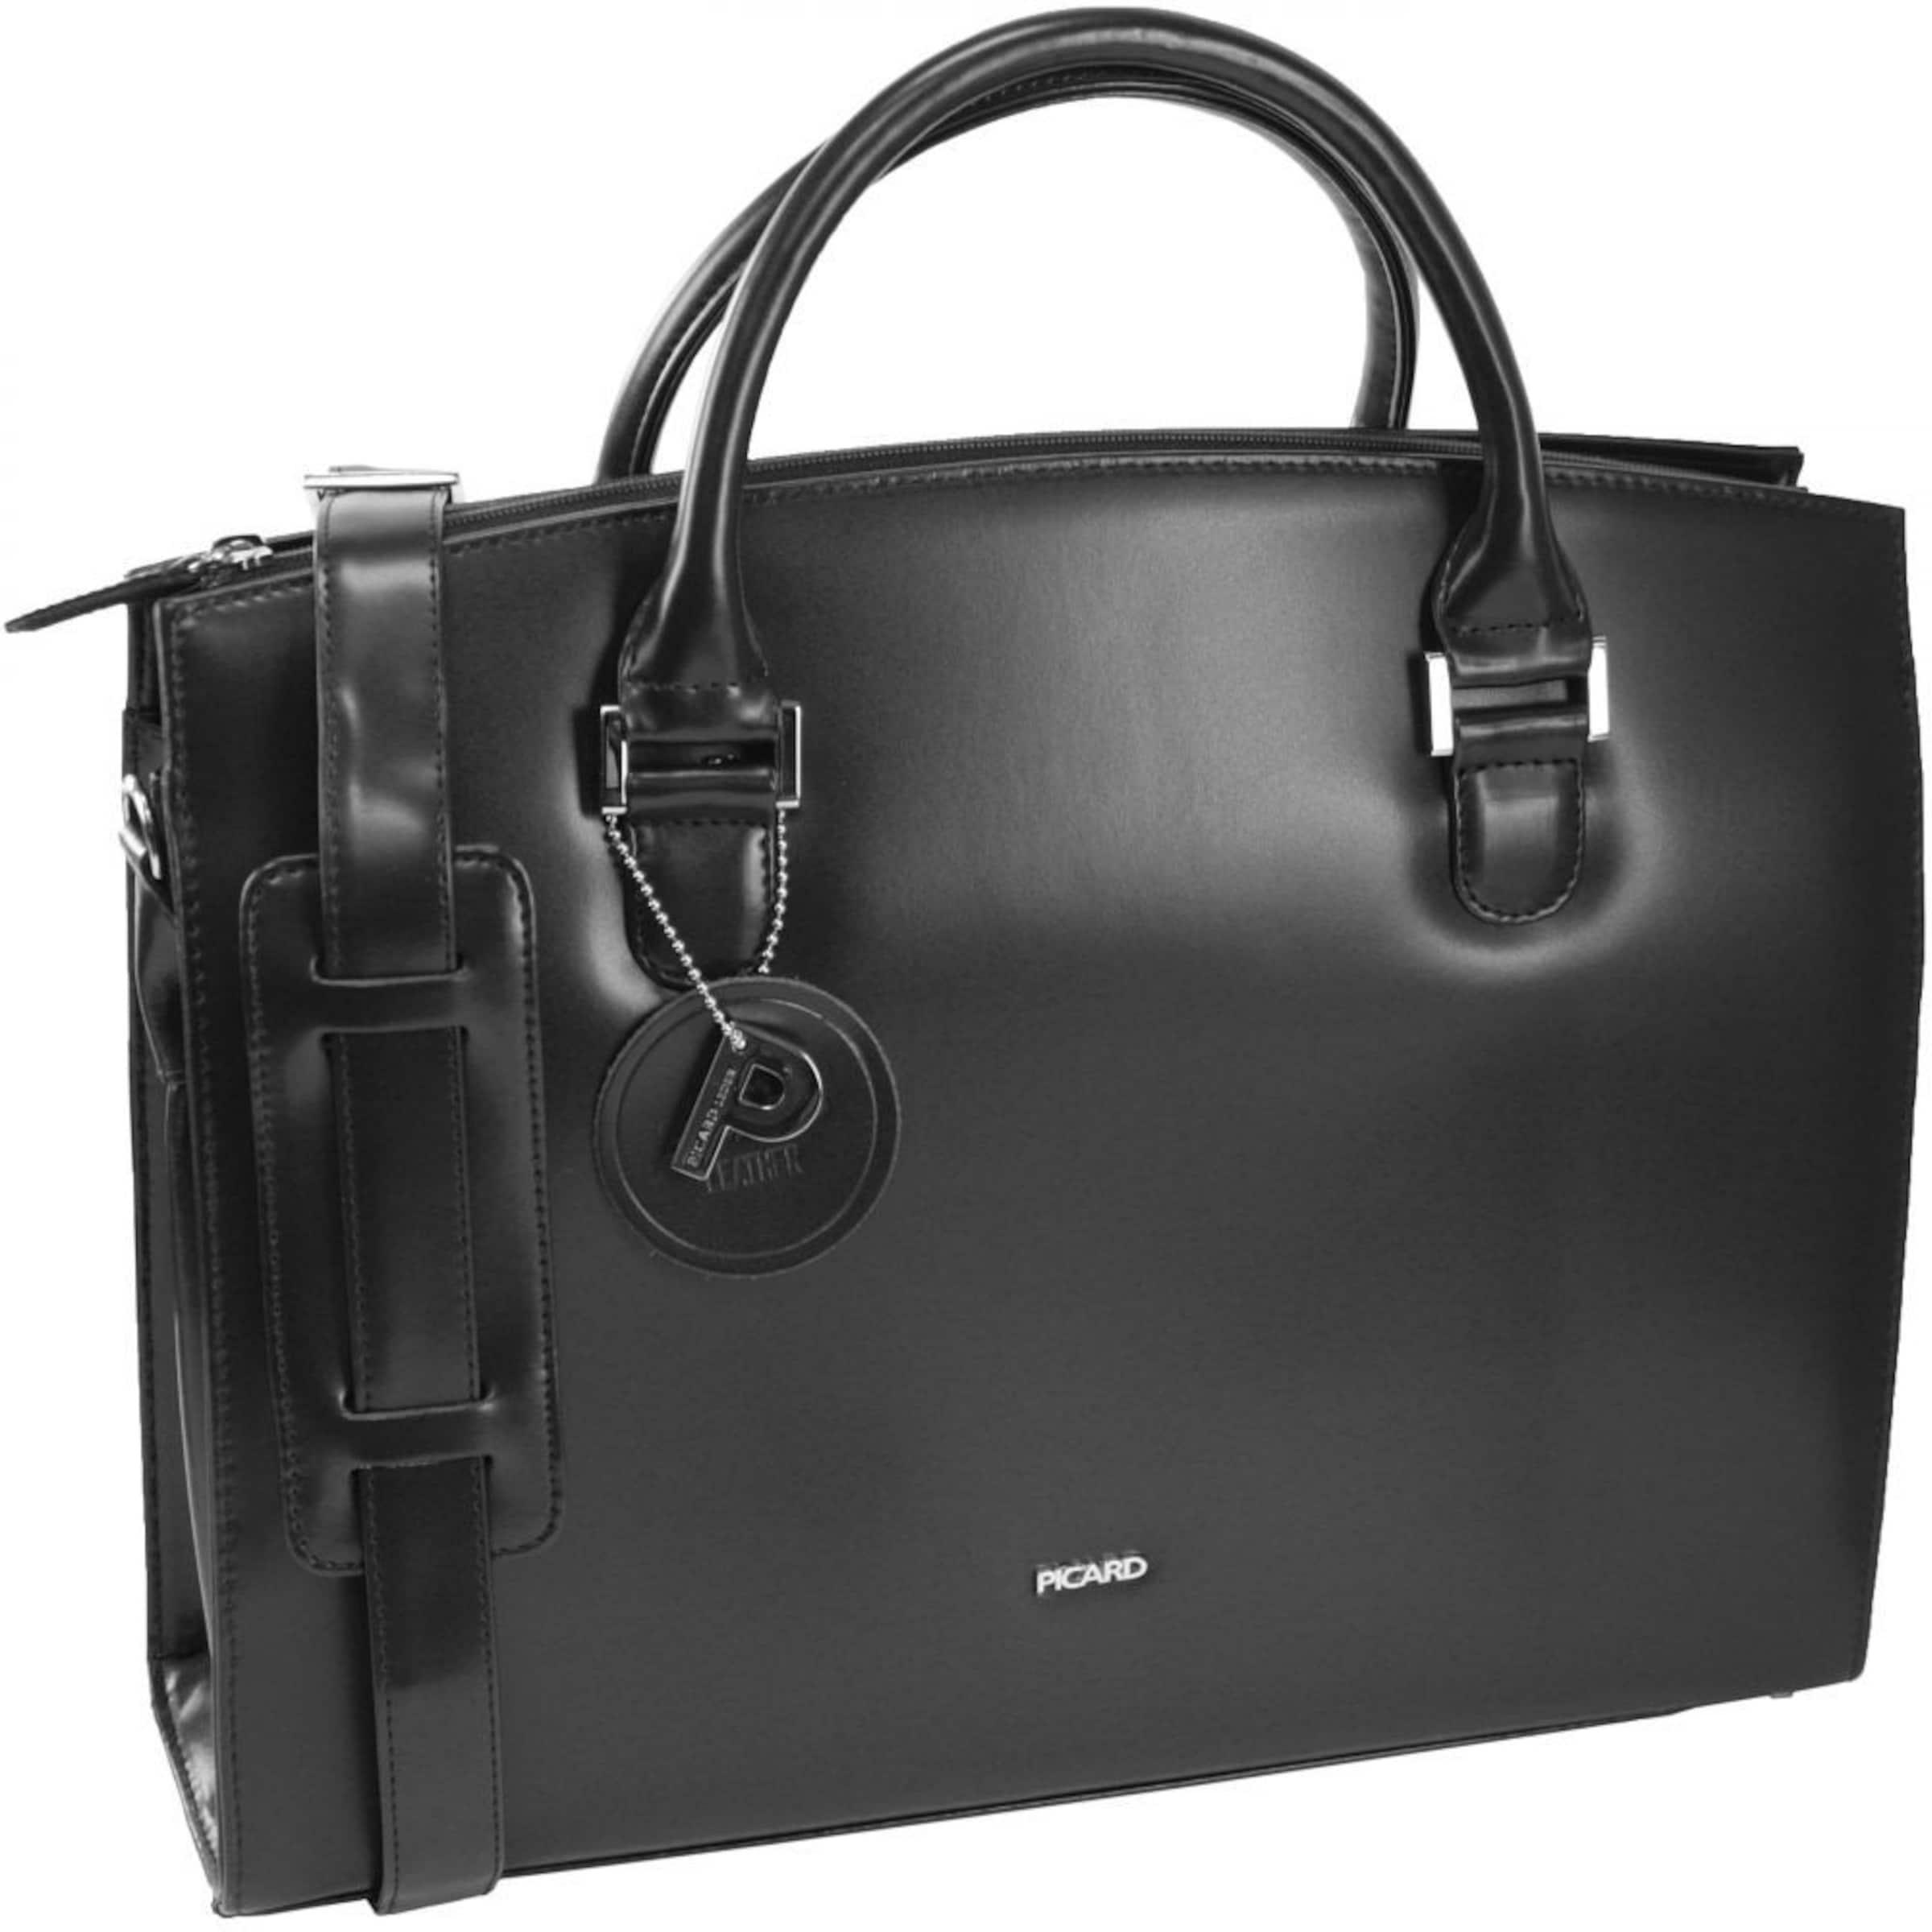 Picard Berlin Business-Handtasche Leder 36 cm Billig Verkauf 2018 olcTE7Owar